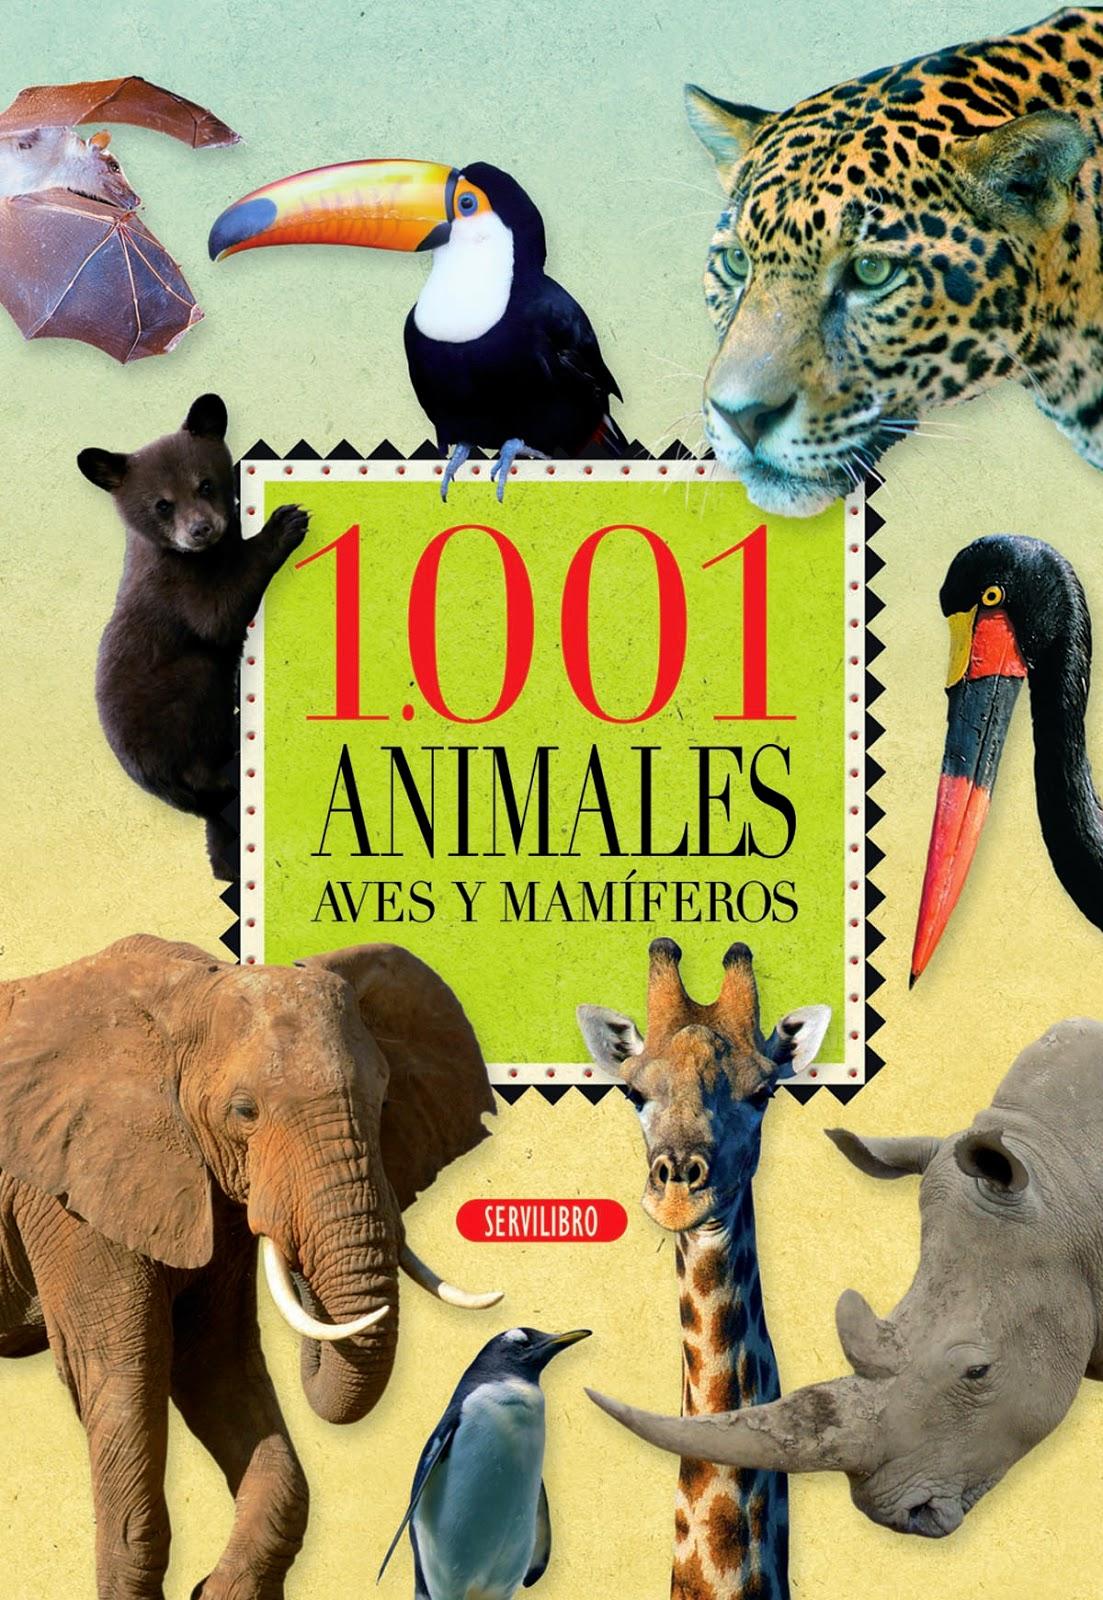 1001 ANIMALES. AVES Y MAMÍFEROS